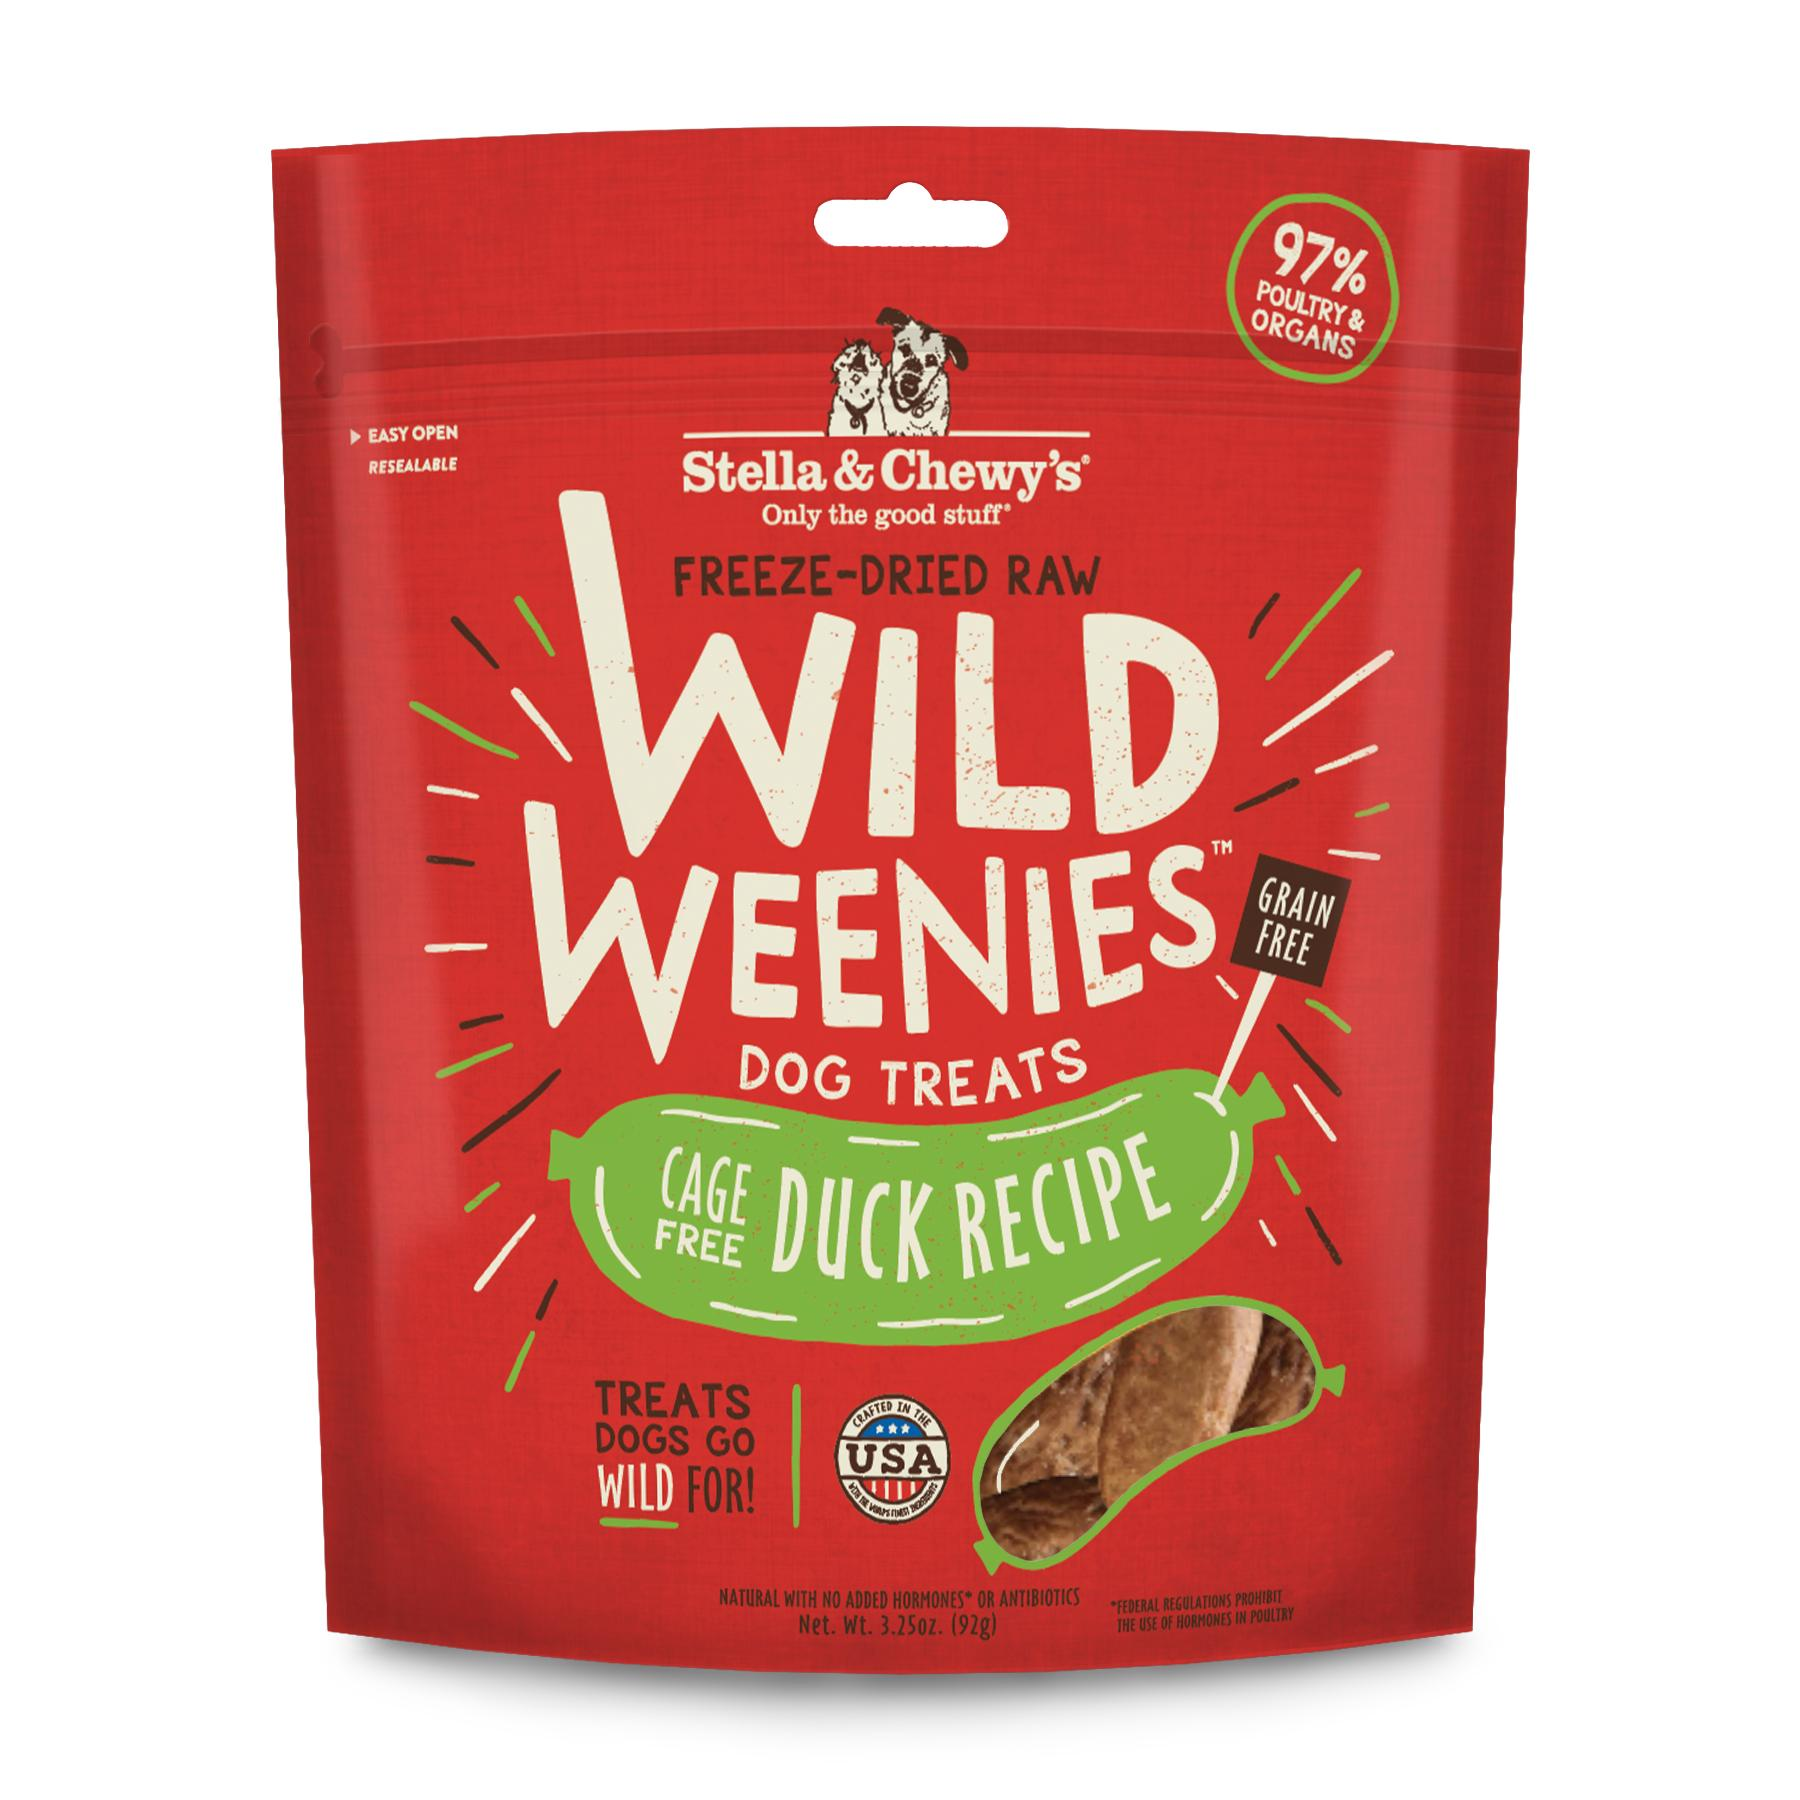 Stella & Chewy's Wild Weenies Cage-Free Duck Recipe Freeze-Dried Dog Treats, 3.25-oz